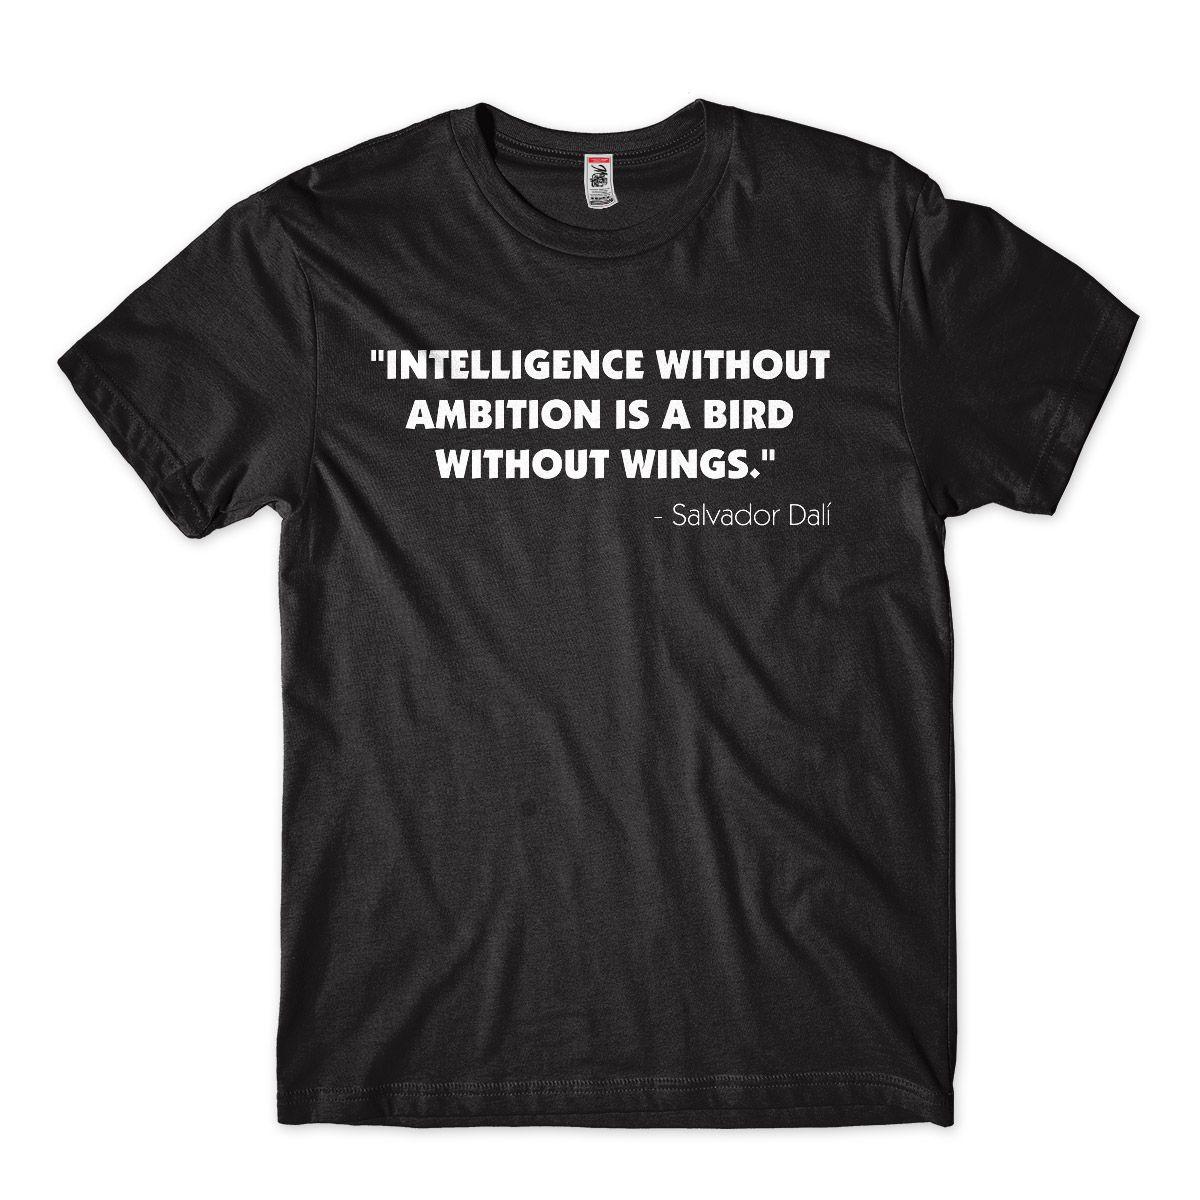 Camisa Dali Citacao Inteligencia sem Asa